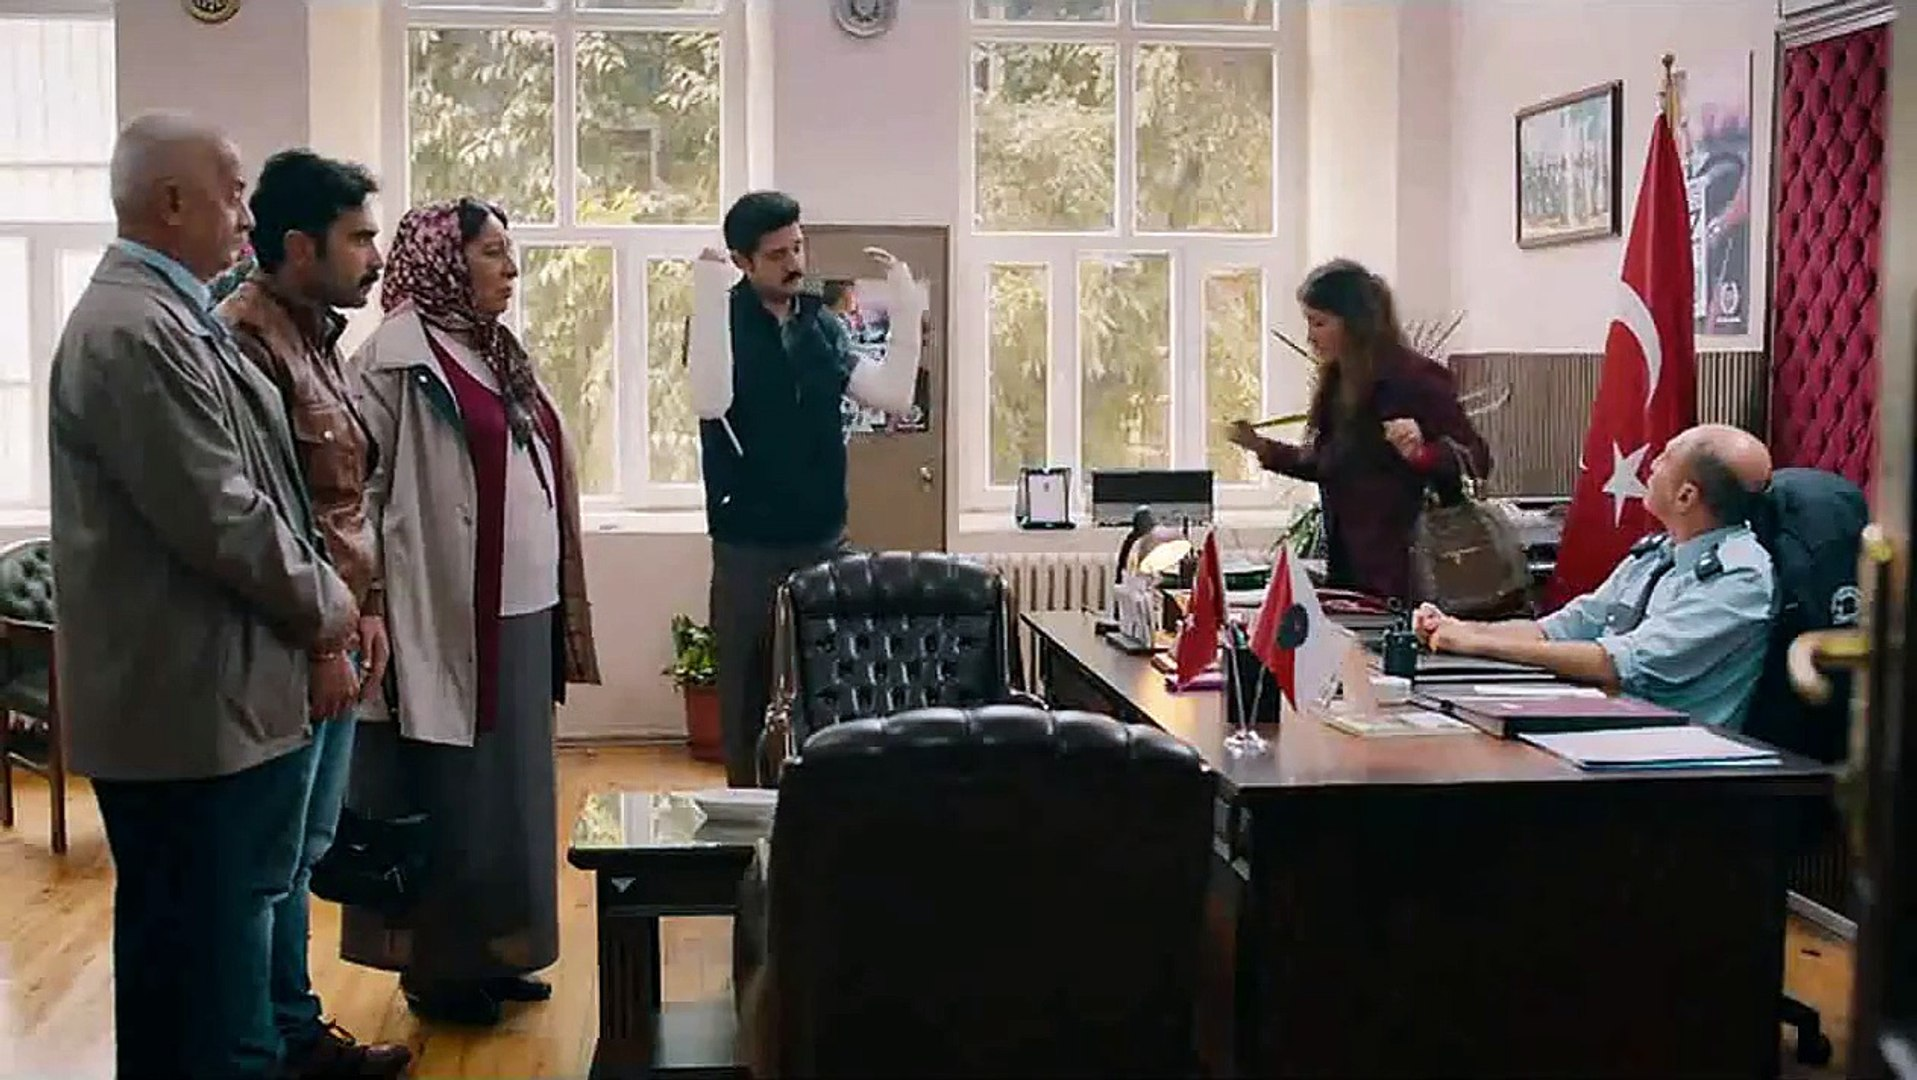 Kaçma Birader 2016 Sansürsüz izle 720p Tek Parça Hd Film